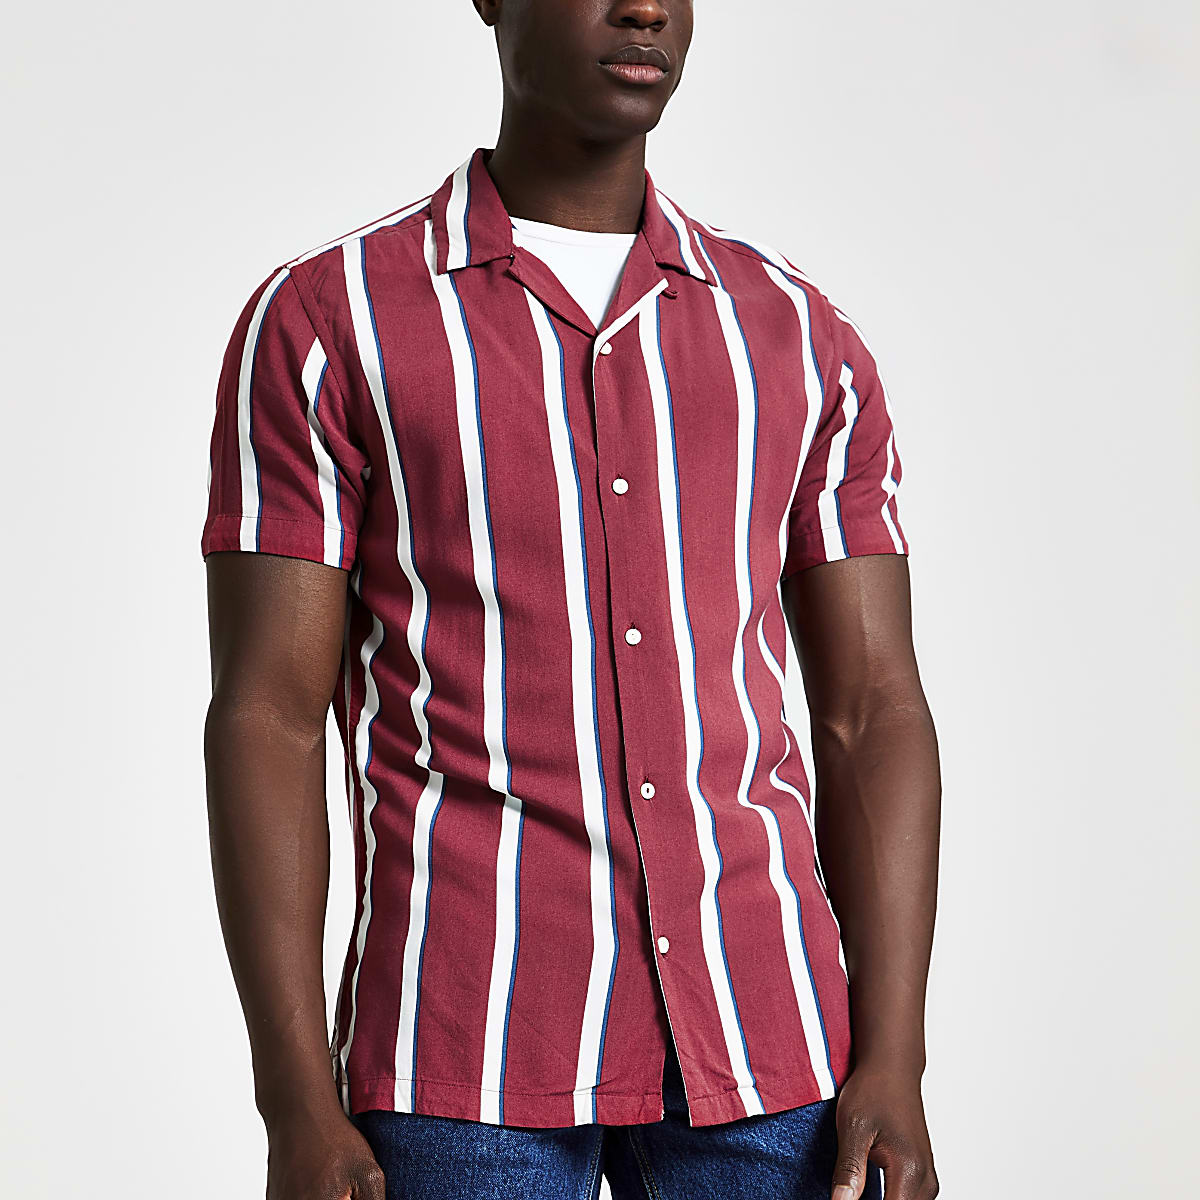 Jack & Jones – Chemise ajustée et rayée rouge